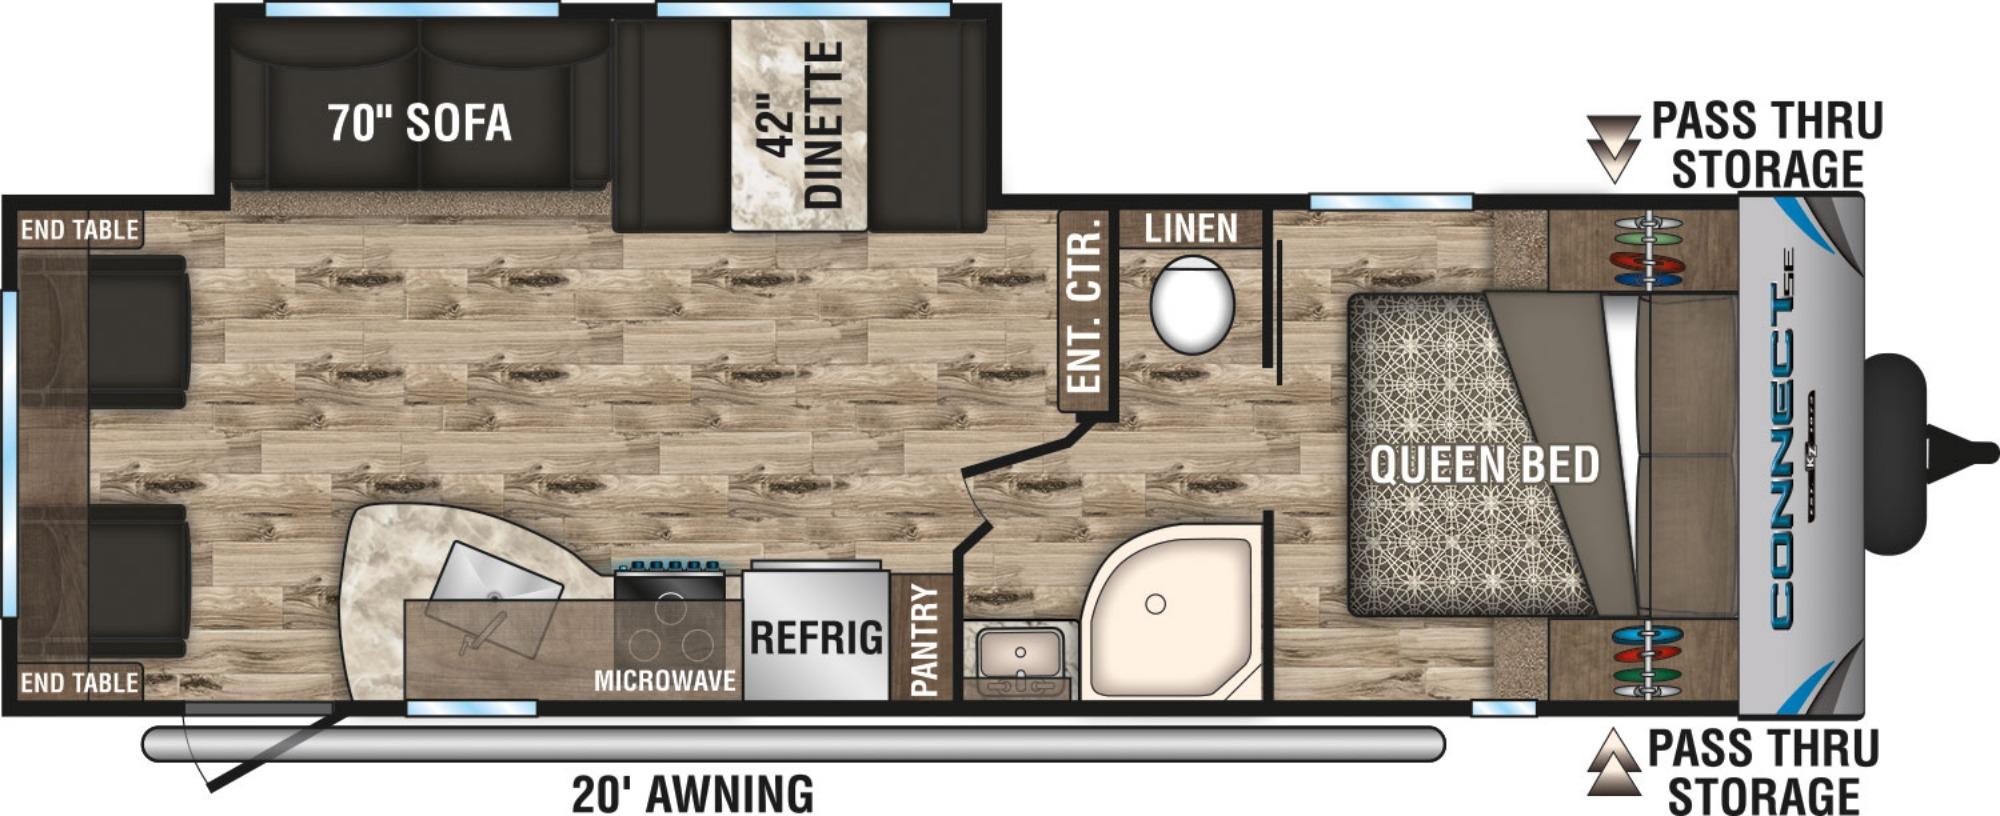 View Floor Plan for 2019 K-Z RV CONNECT SE 271RLSE